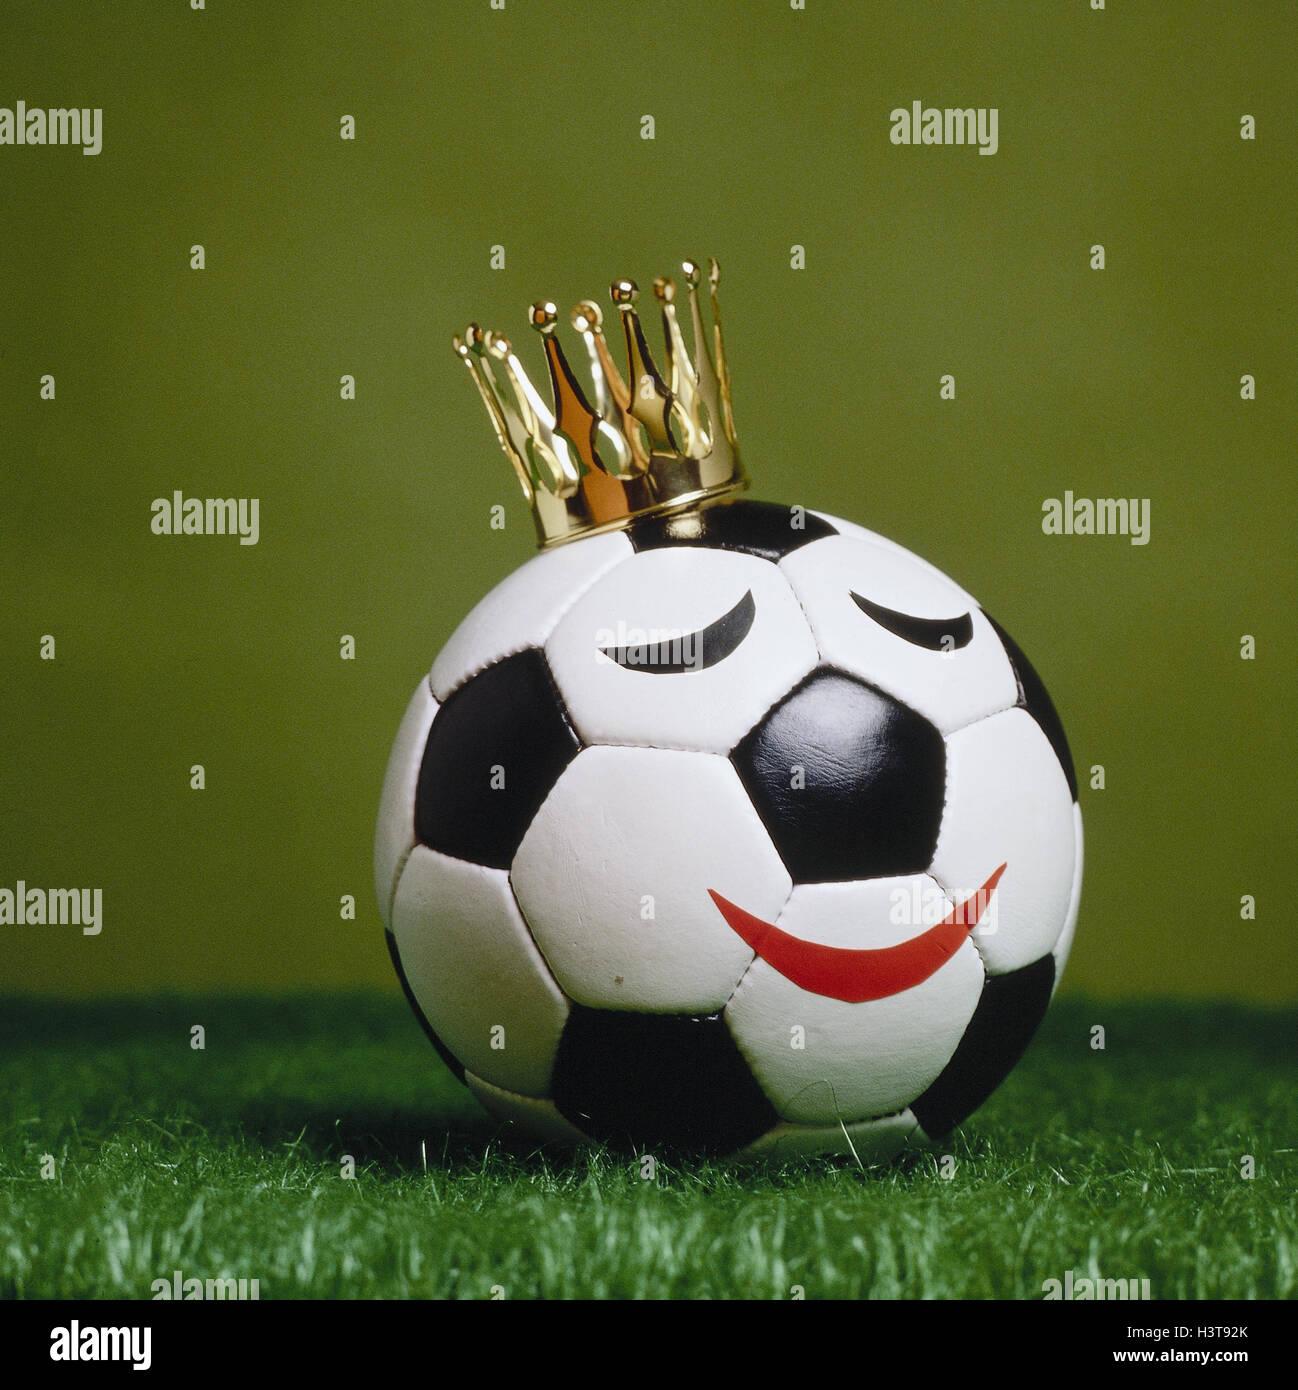 Football, crown, 'king of football', icon, material recording, world championship, world championship, EM, - Stock Image